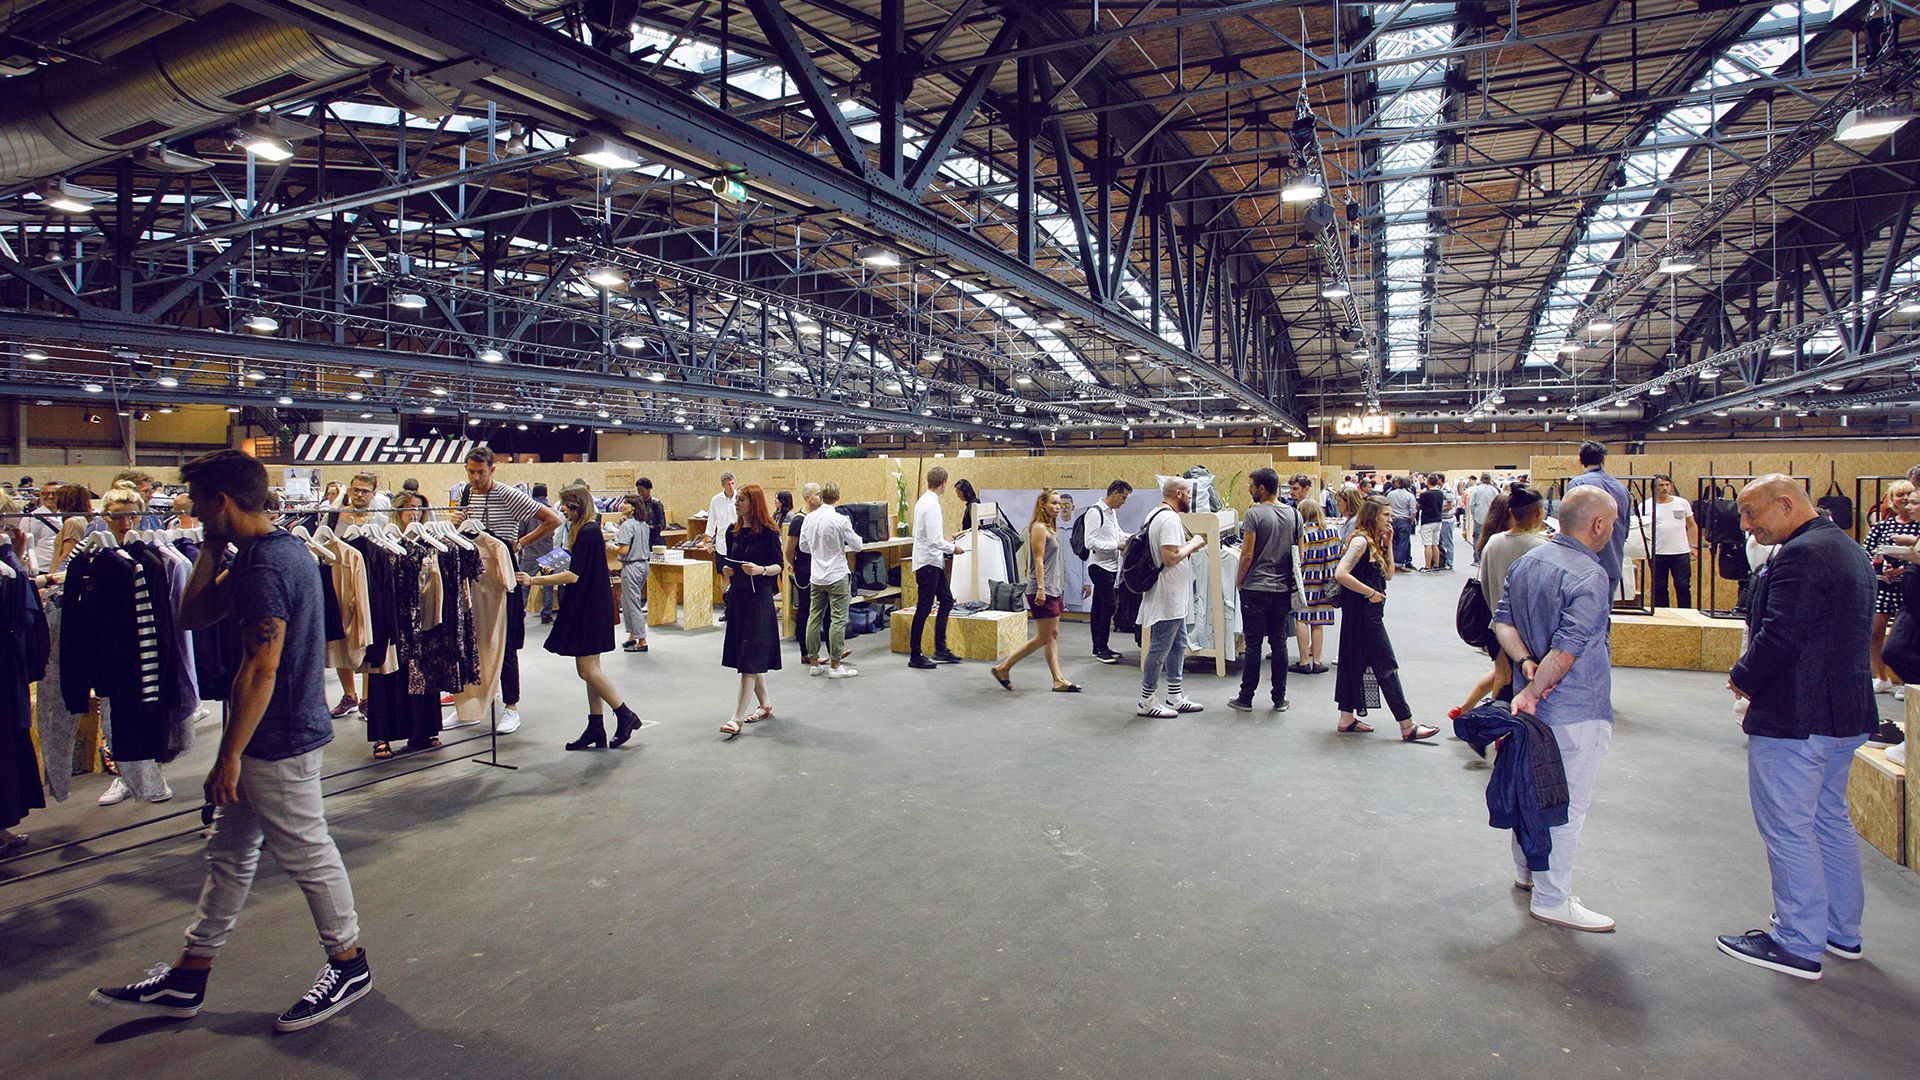 Seek, feria de moda, sneakers, fashion fair, berlin, UFI, Barómetro de ferias, negocio de ferias, Kai Hattendorf